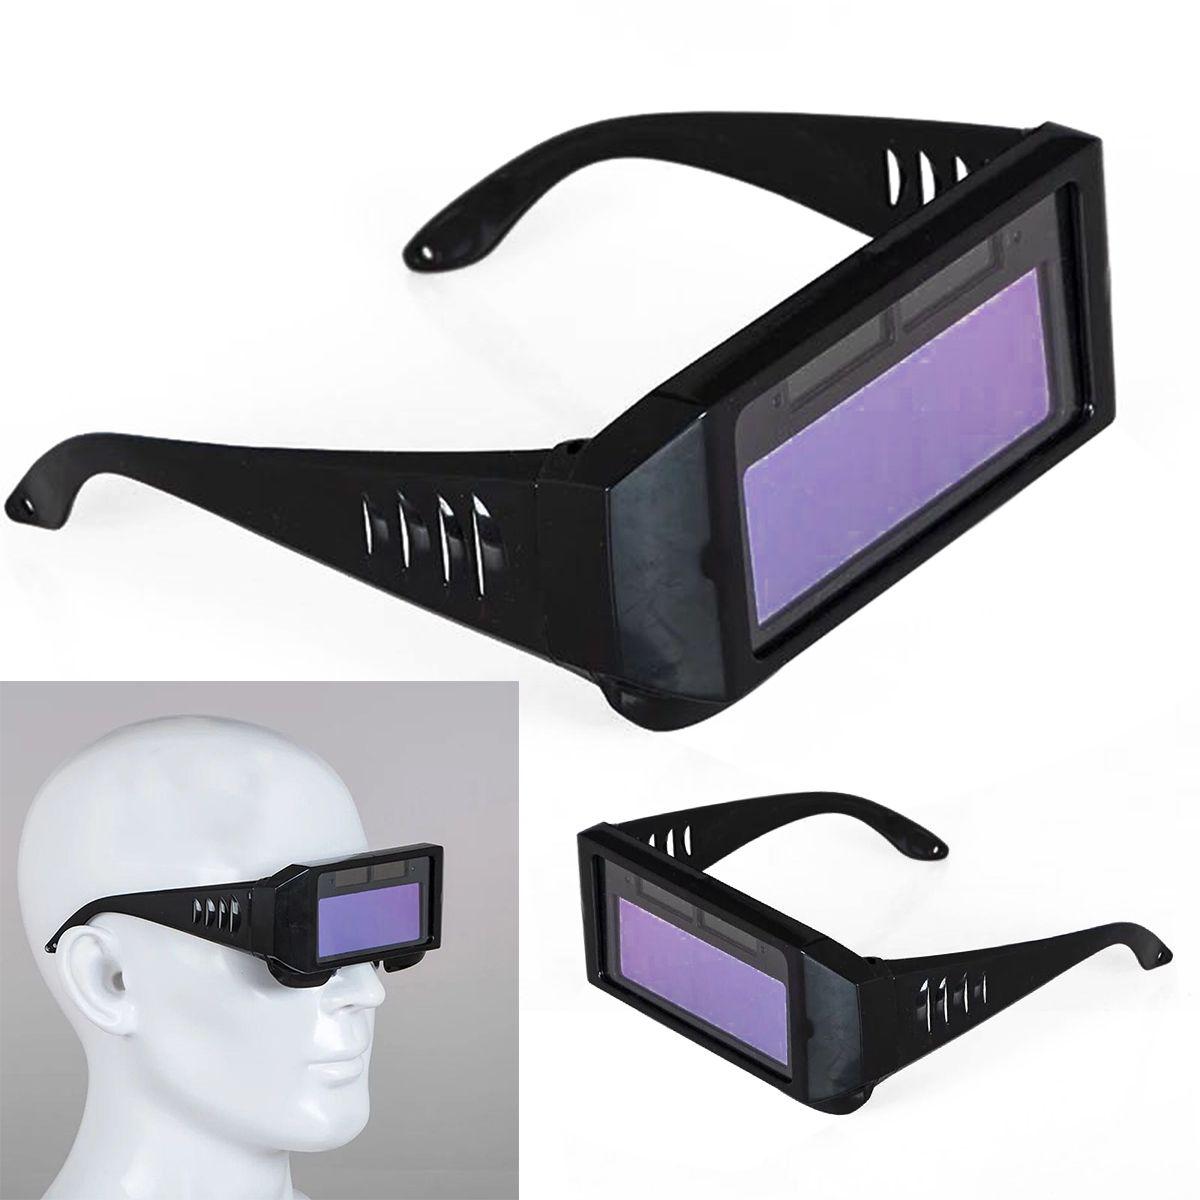 1pc Mayitr Solar Auto Darkening Welding Mask Heat Resistant Welder Helmet Eyes Goggle Glasses Arc Welding Accessories